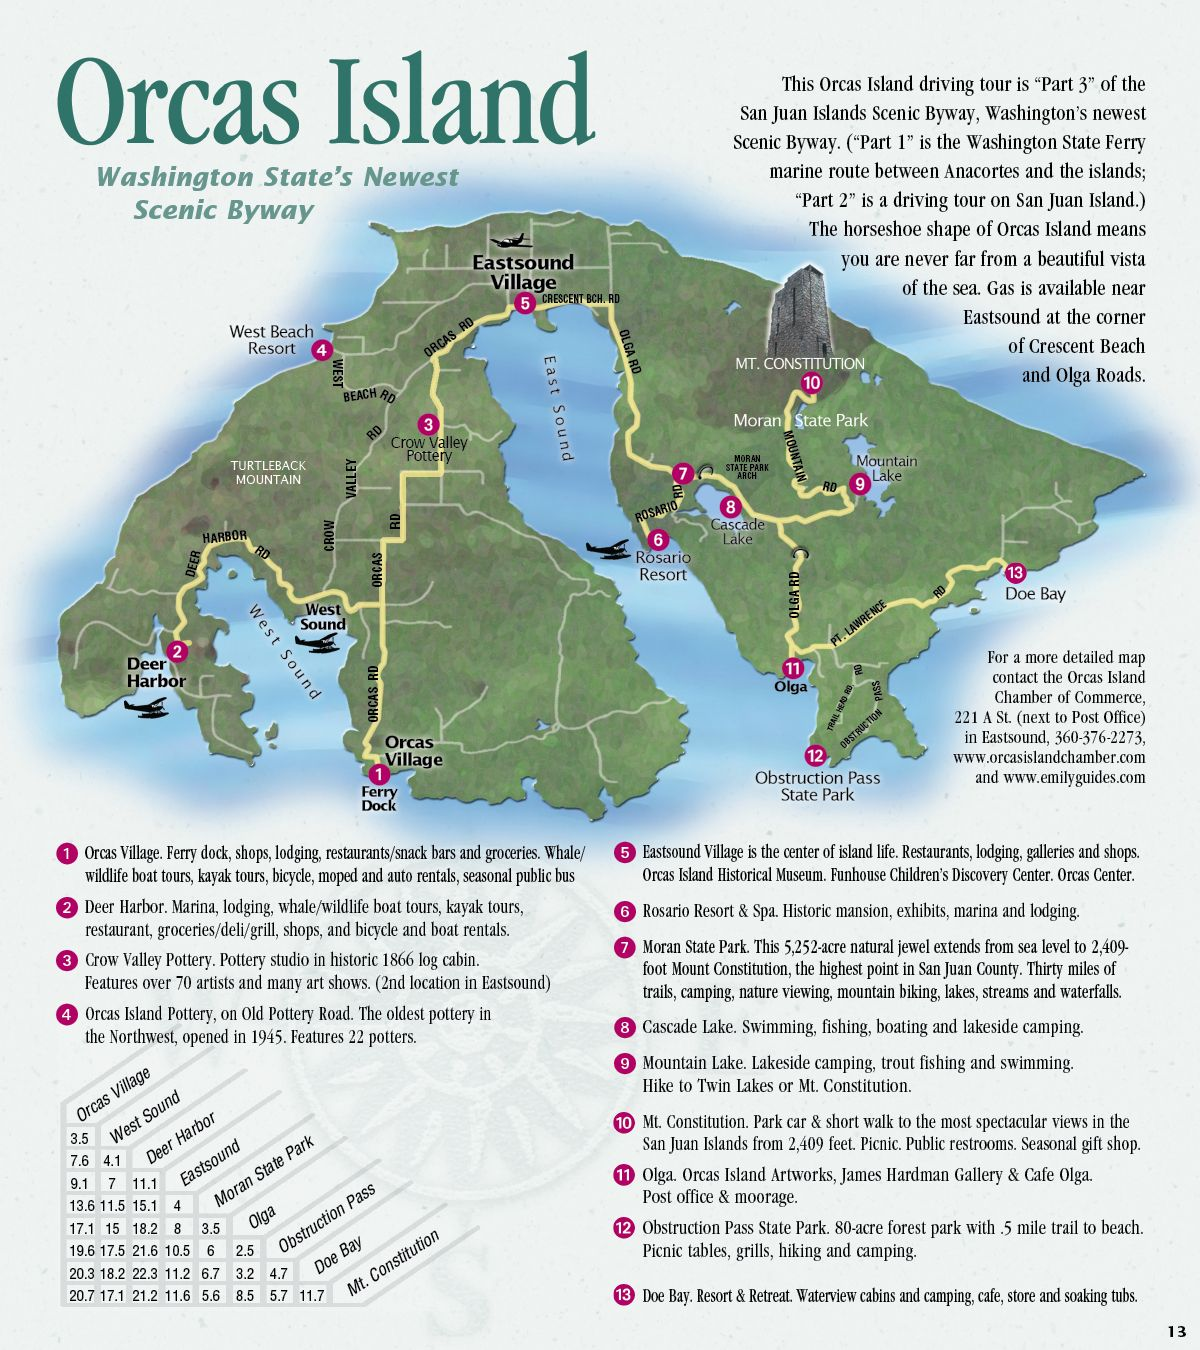 Scenic Byway Driving Tour Eastsound Landmark Inn Orcas Island Washington Travel Washington State Travel Pacific Northwest Travel